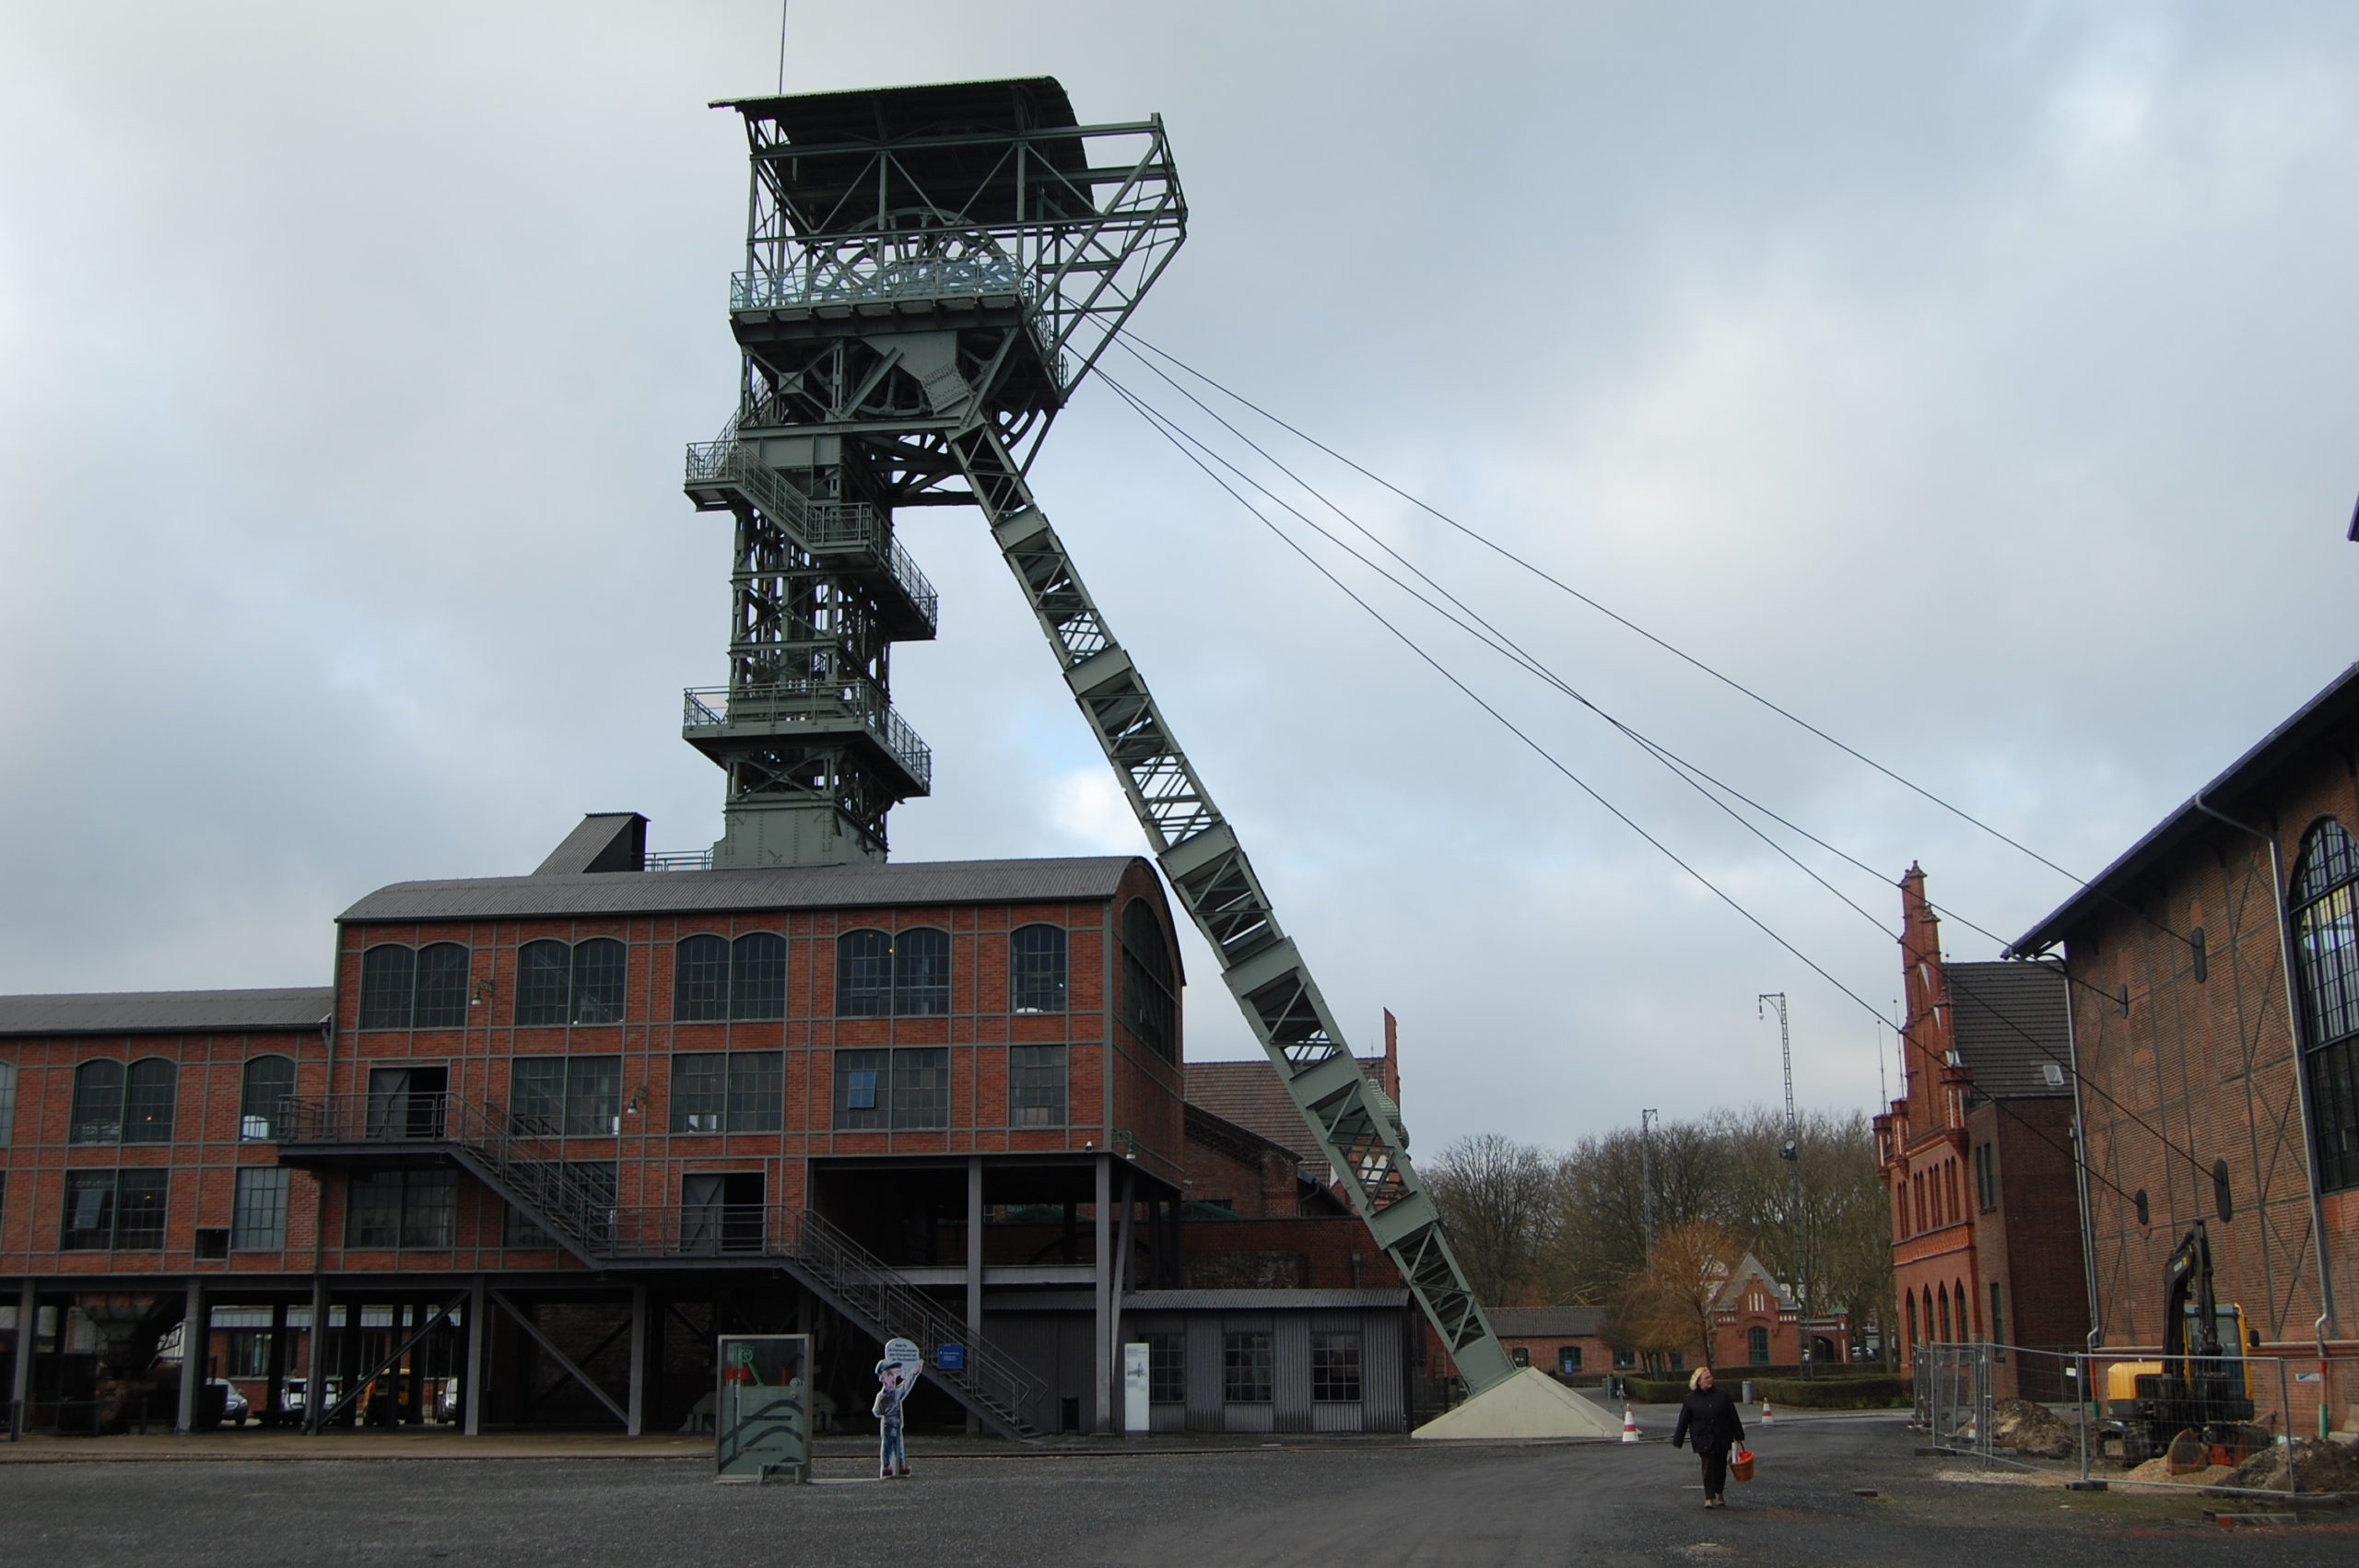 Förderturm über Schacht II der Zeche Zollern in Dortmund-Bövinghausen, Foto: Revierkohle